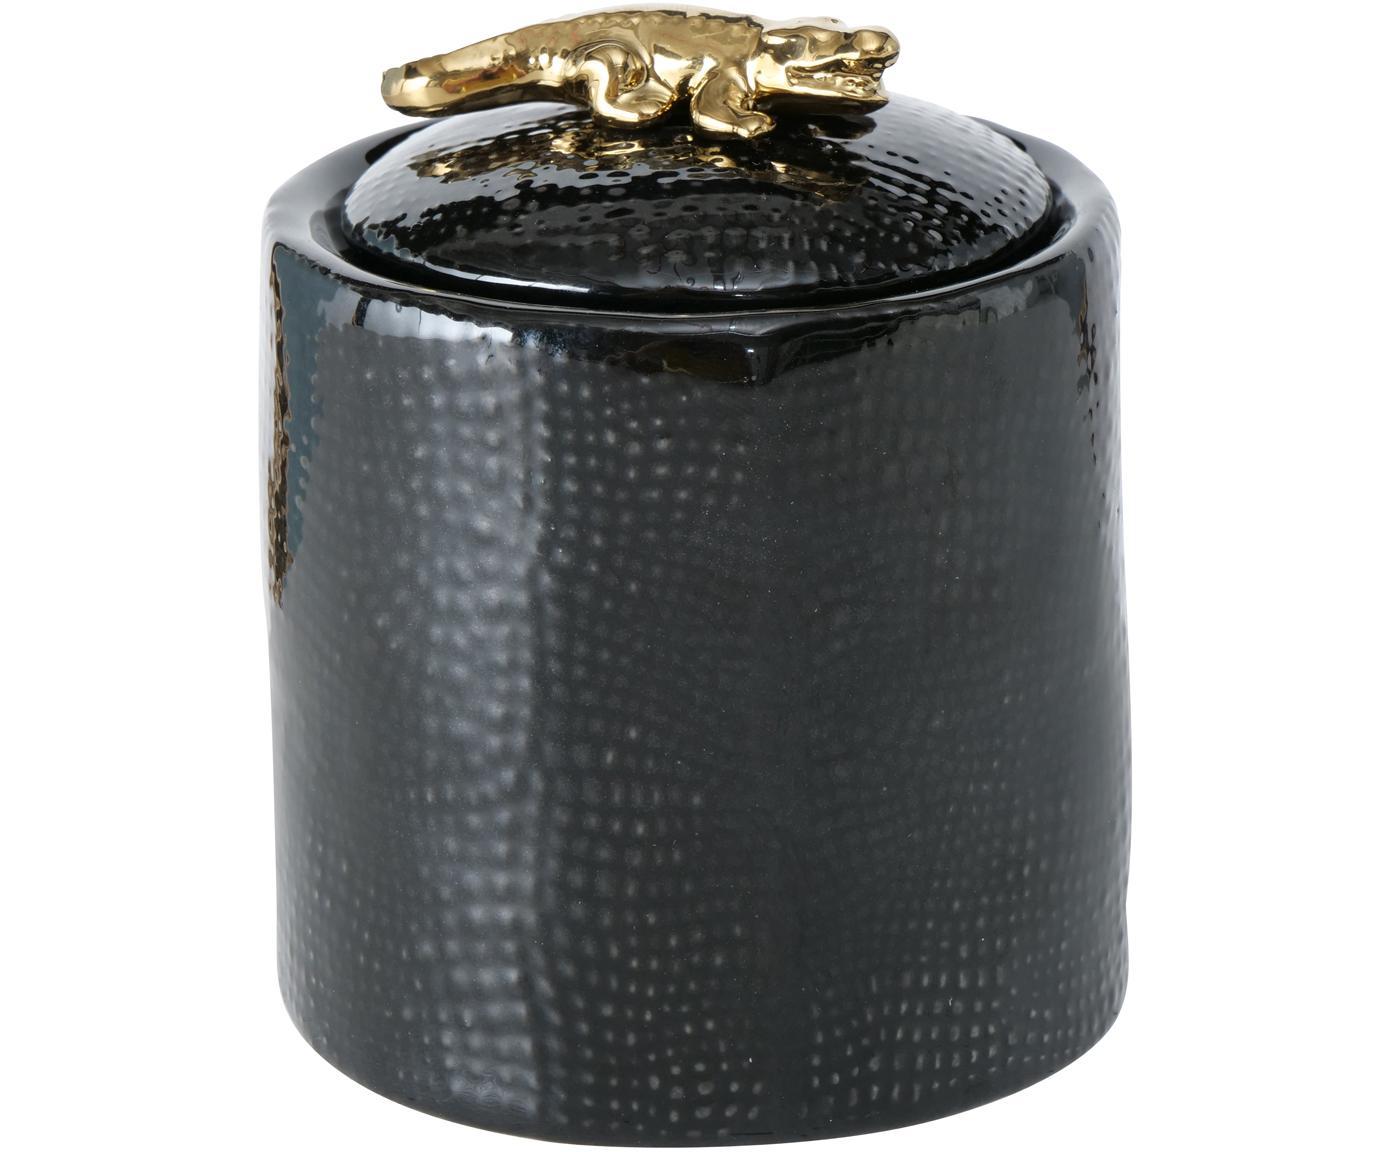 Sieradendoos Kroko, Porselein, Zwart, Ø 9 cm